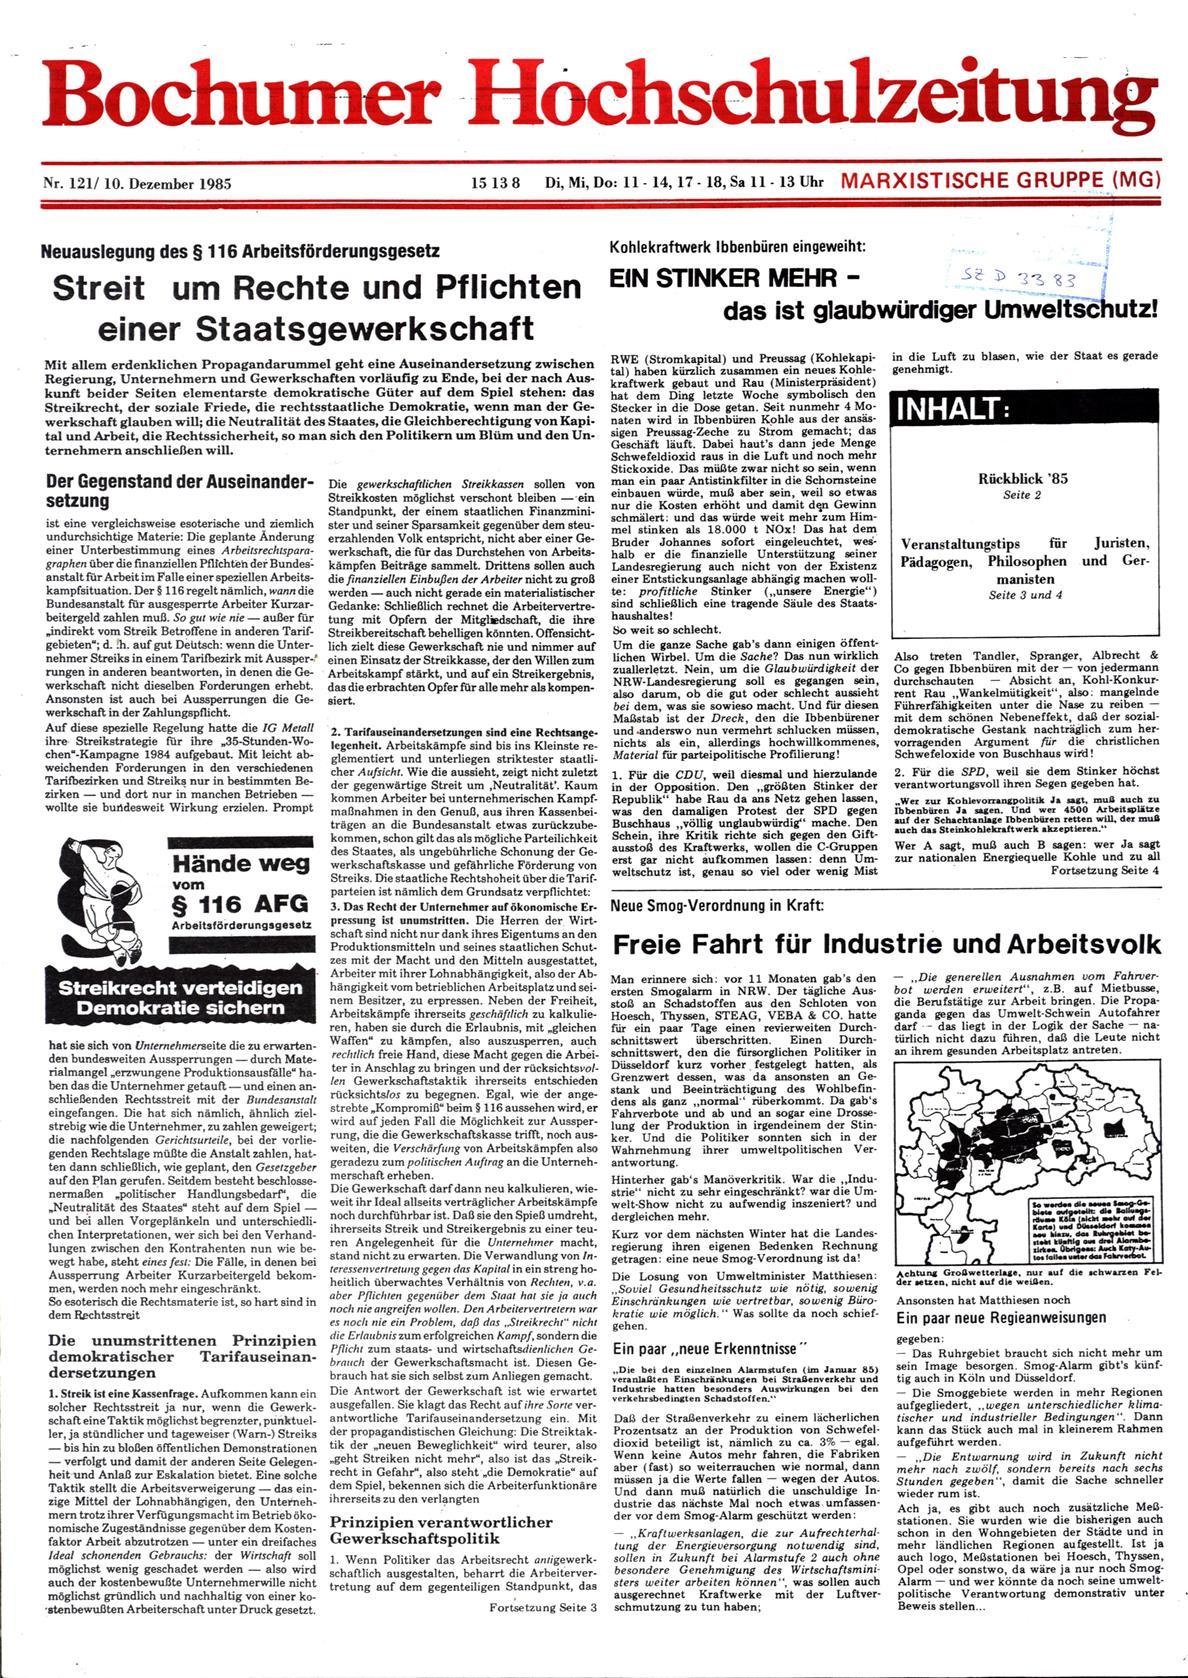 Bochum_BHZ_19851210_121_001